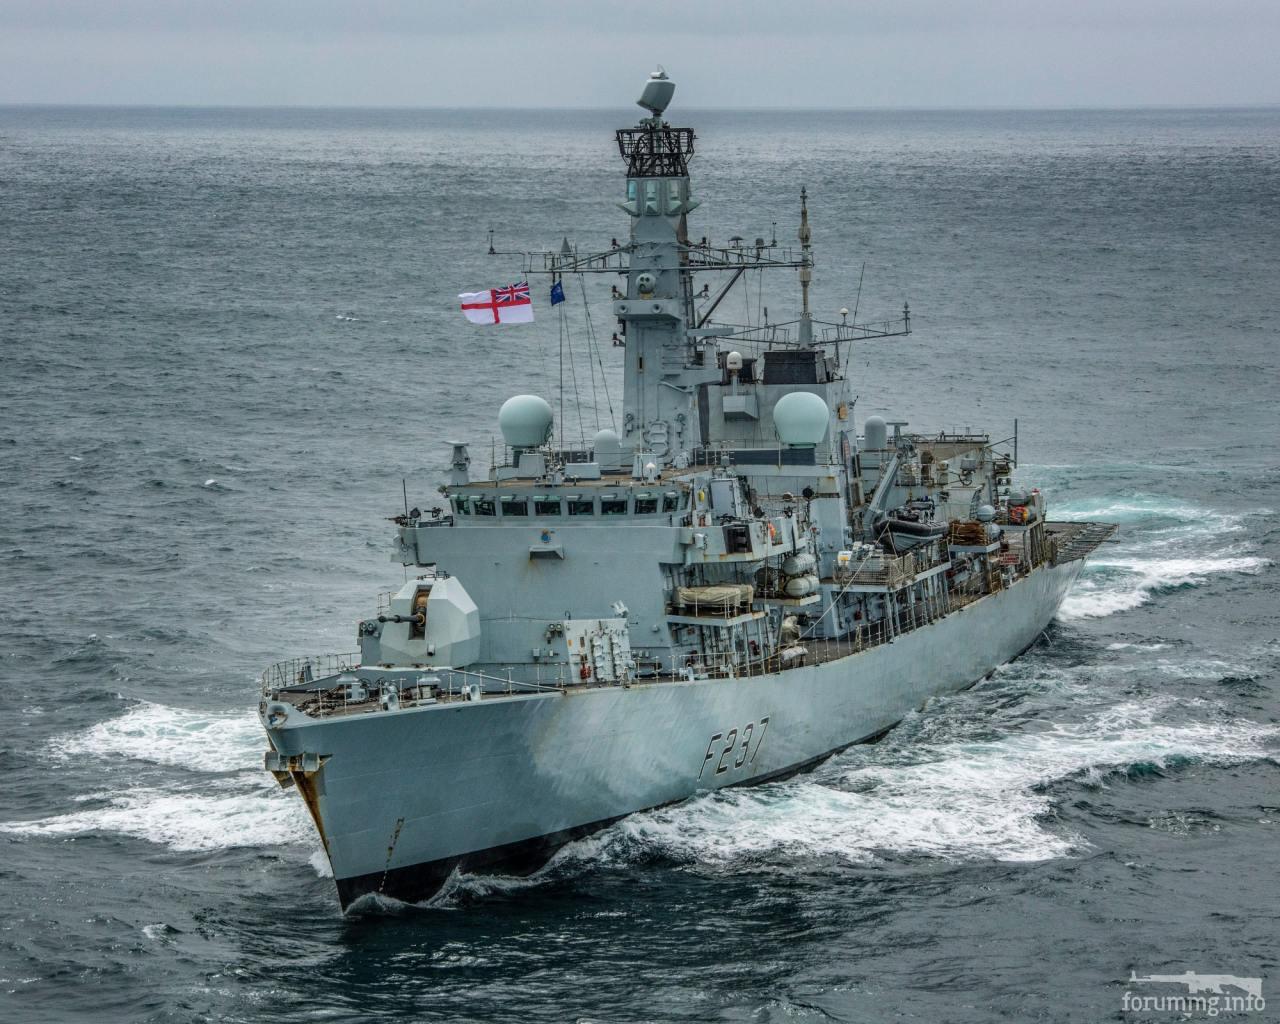 116629 - Фрегат HMS Westminster (F237)